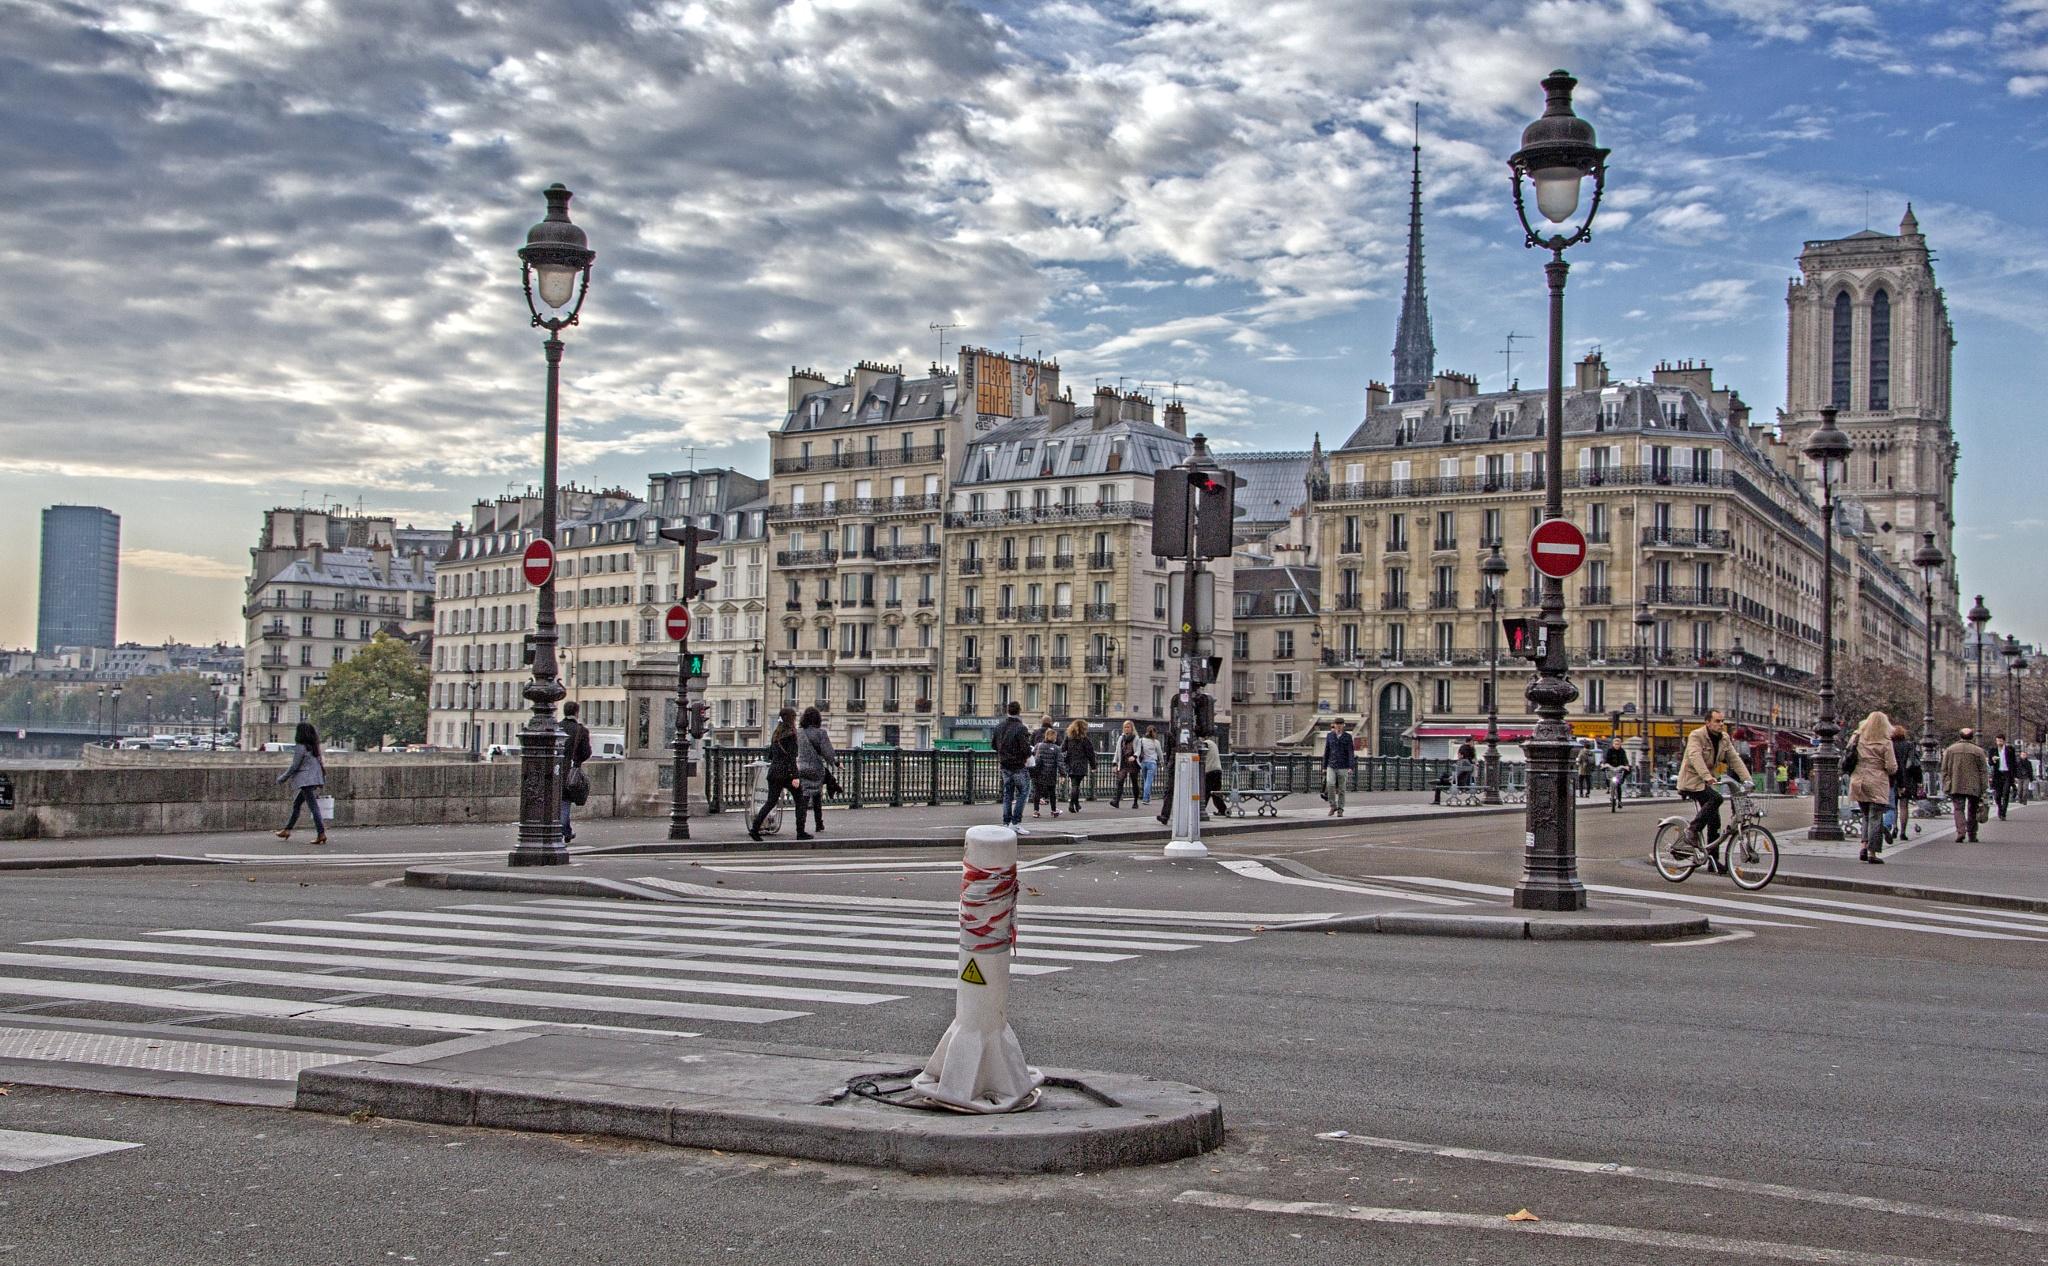 Paris Morning by Michael Stapfer